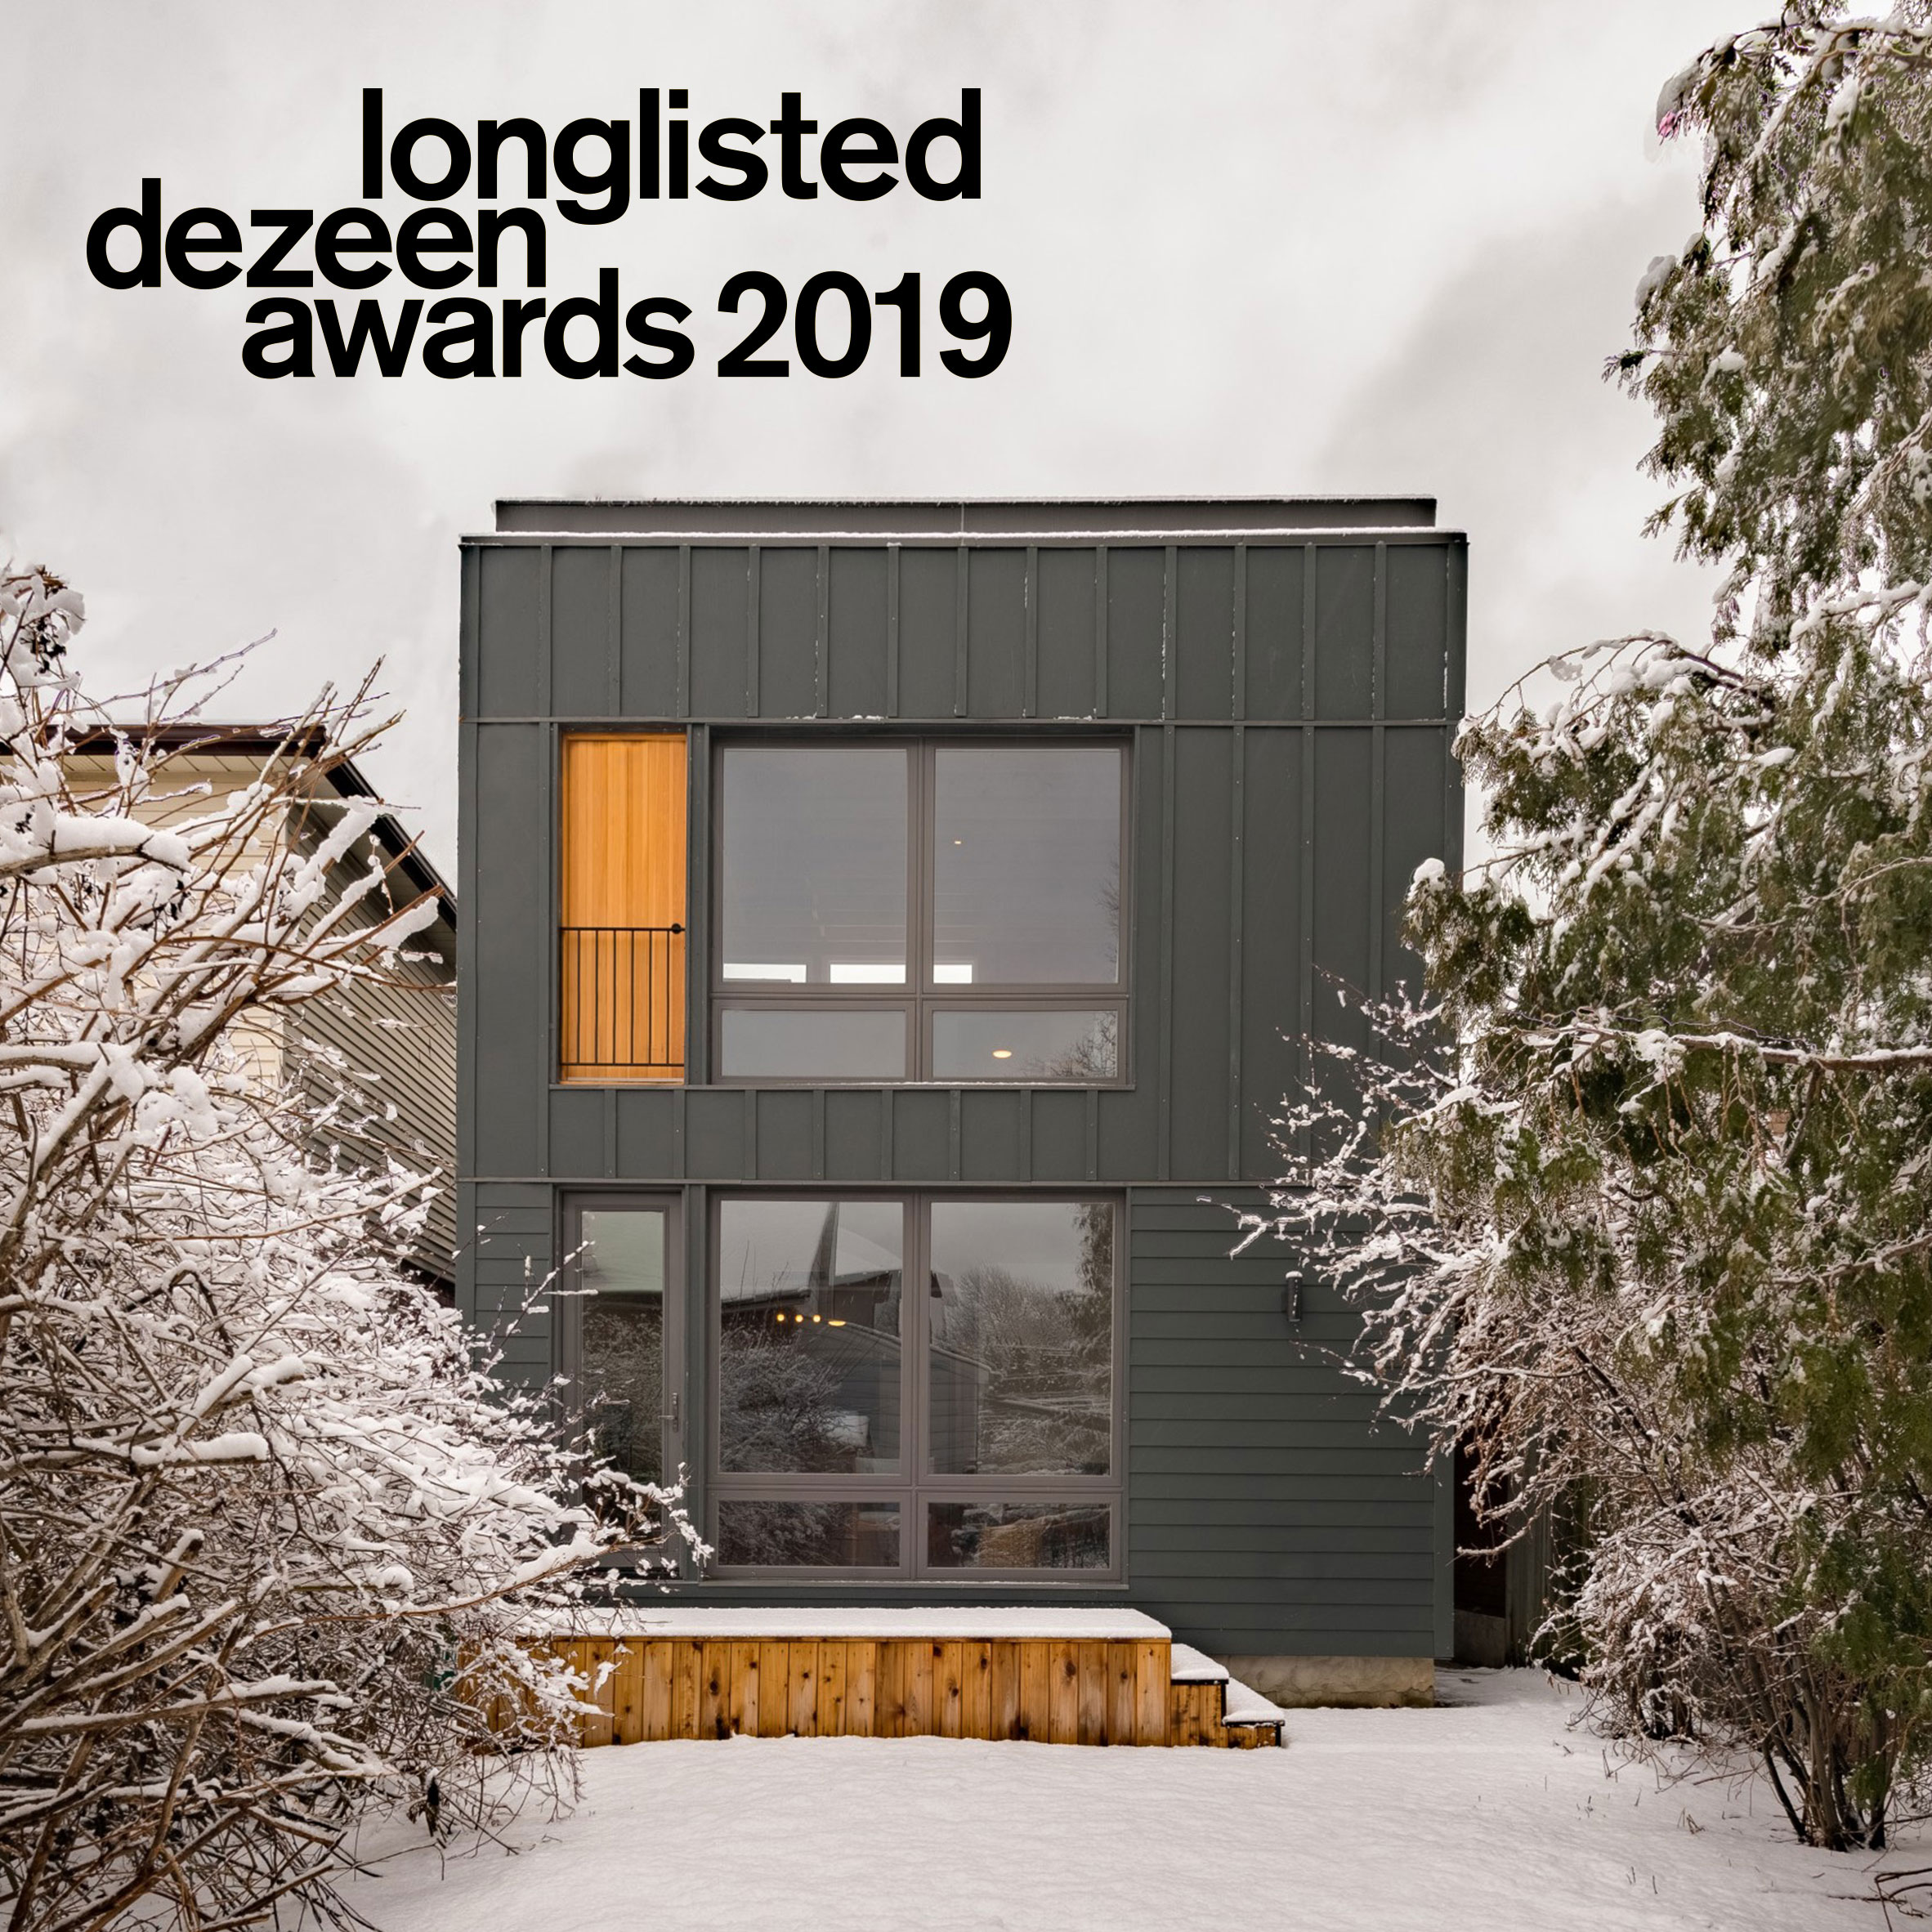 dezeen-awards-2019-longlist-east-york-residence.jpg